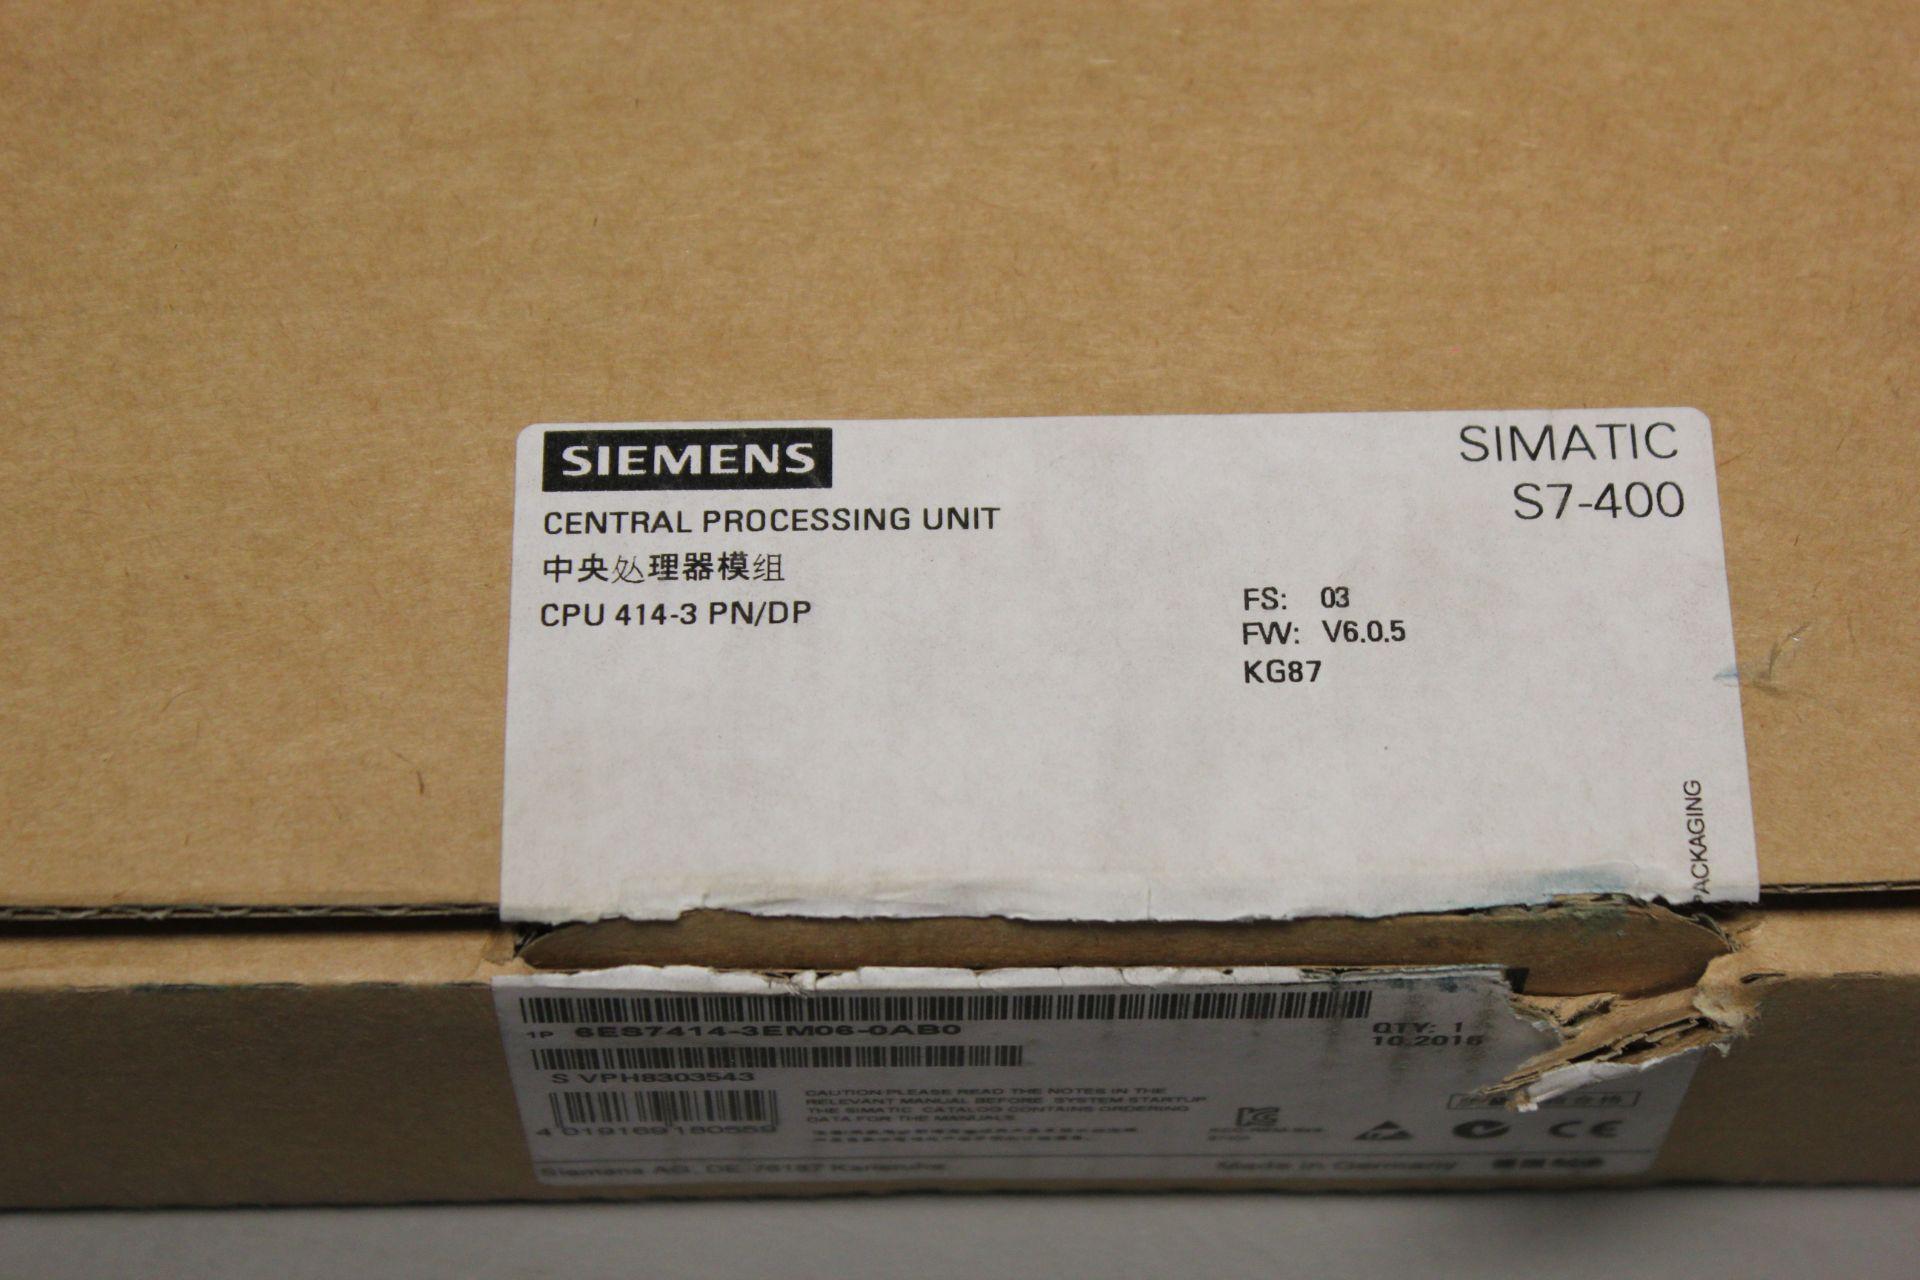 NEW SIEMENS SIMATIC S7-400 PLC CPU PROCESSOR - Image 2 of 8